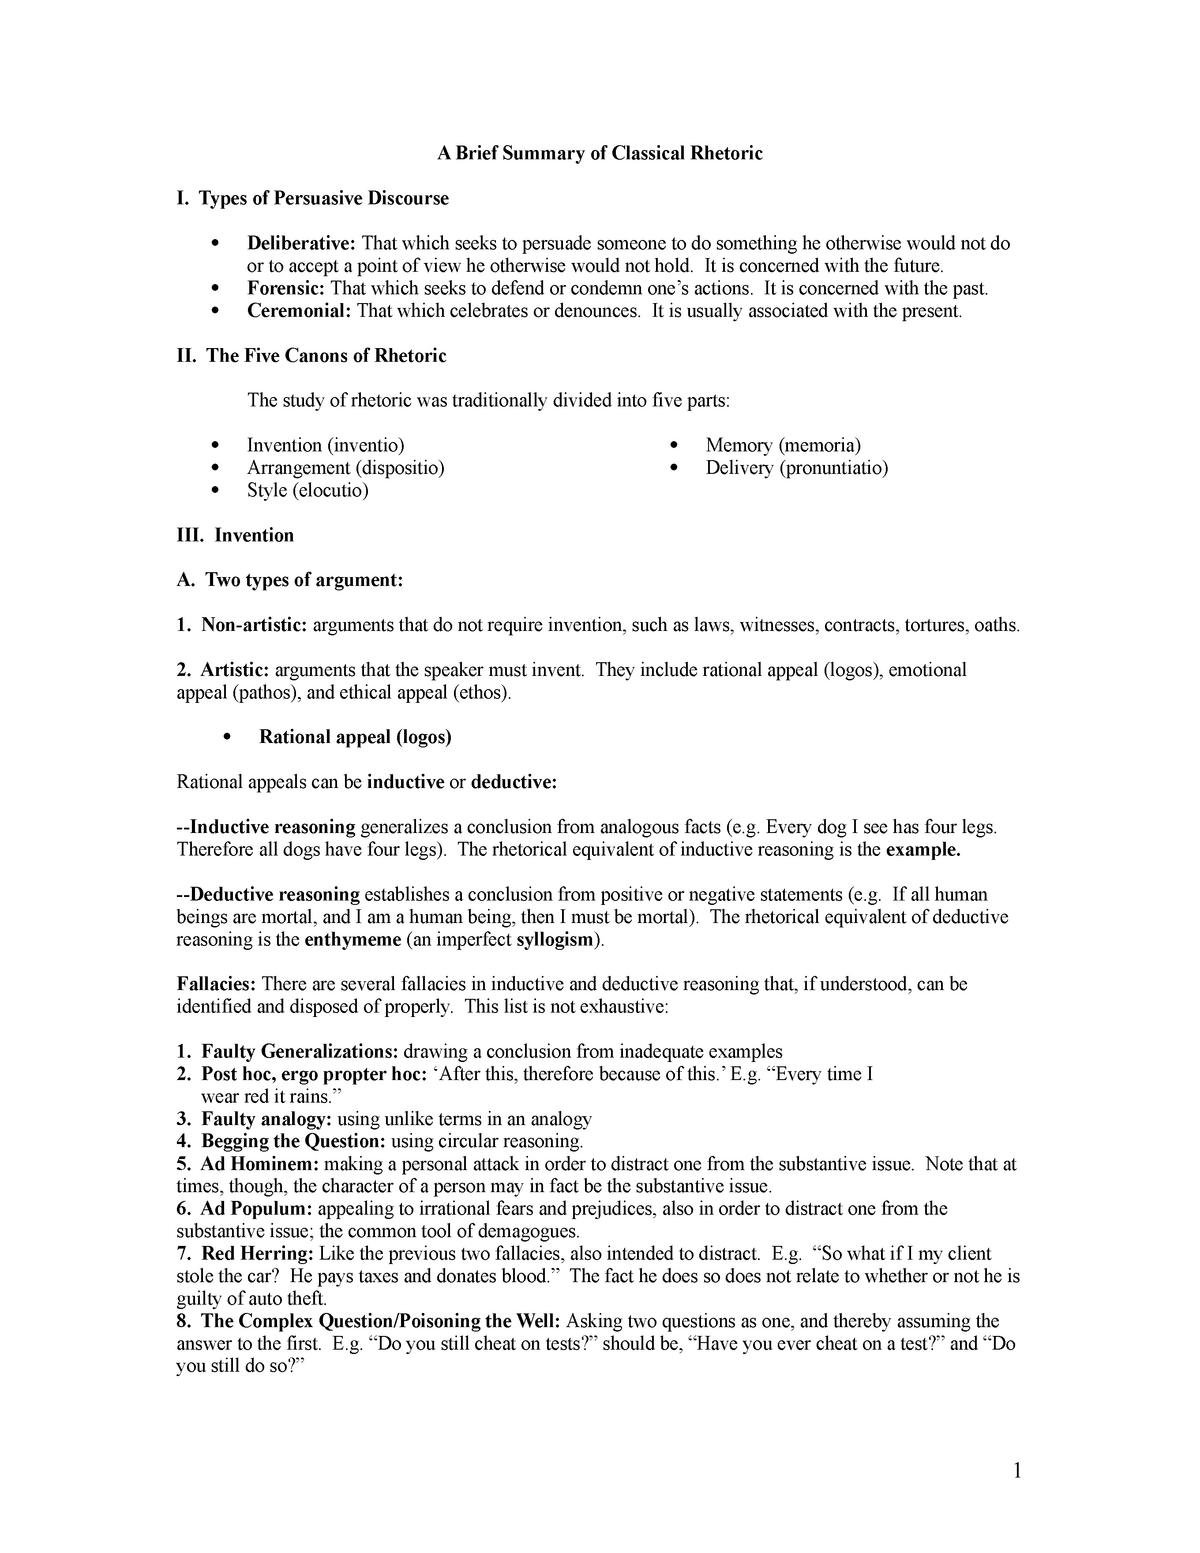 CDA Summary, rhetoric - Critical Discourse Analysis - UWE